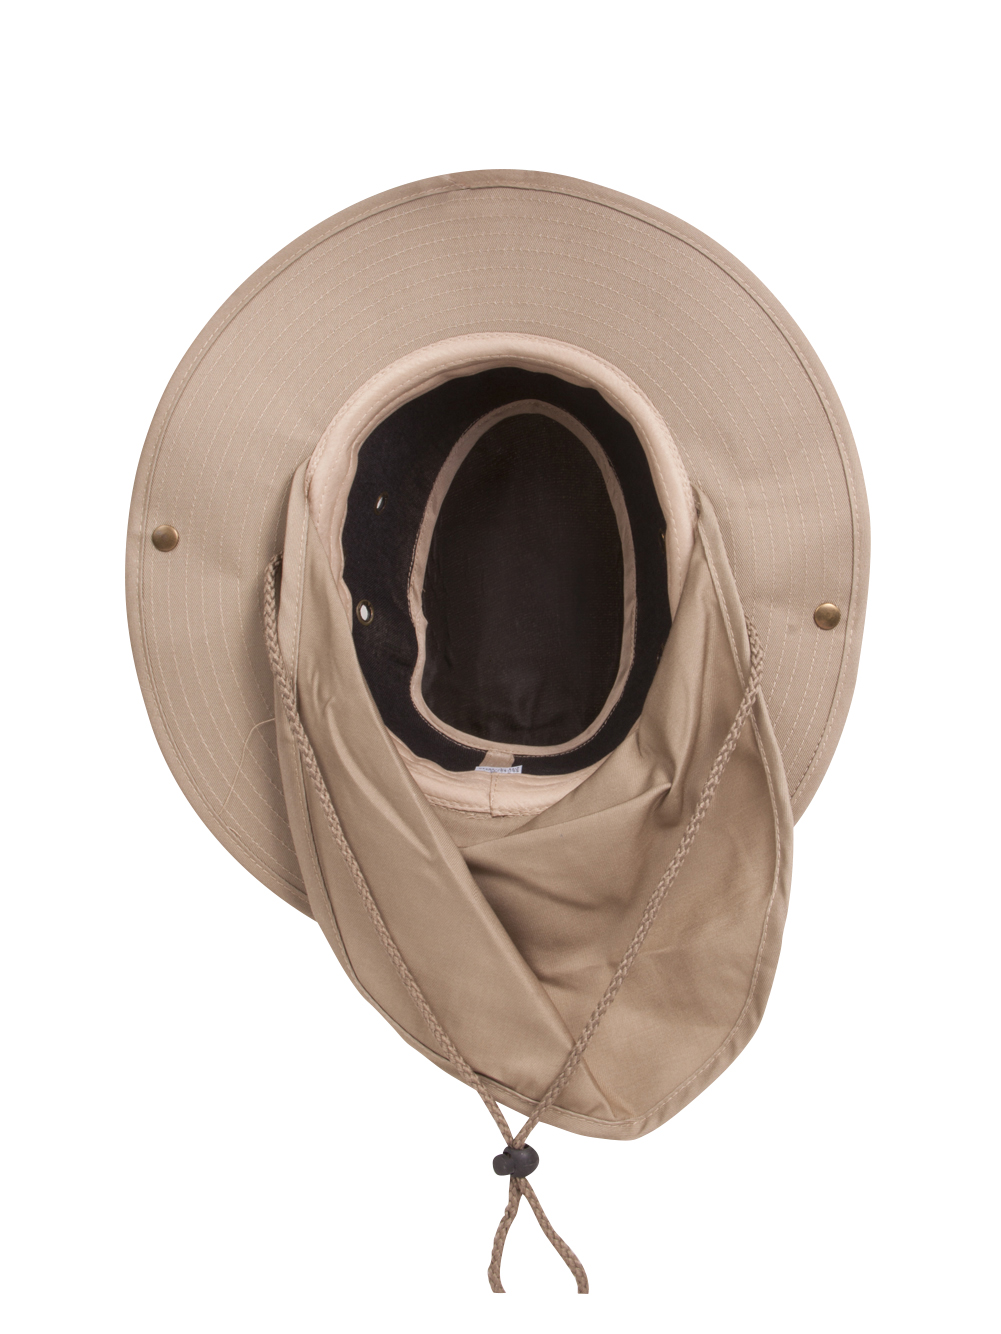 Top Headwear Safari Explorer Bucket Hat With Flap Neck Cover - Beige ... 31cd1ed02398